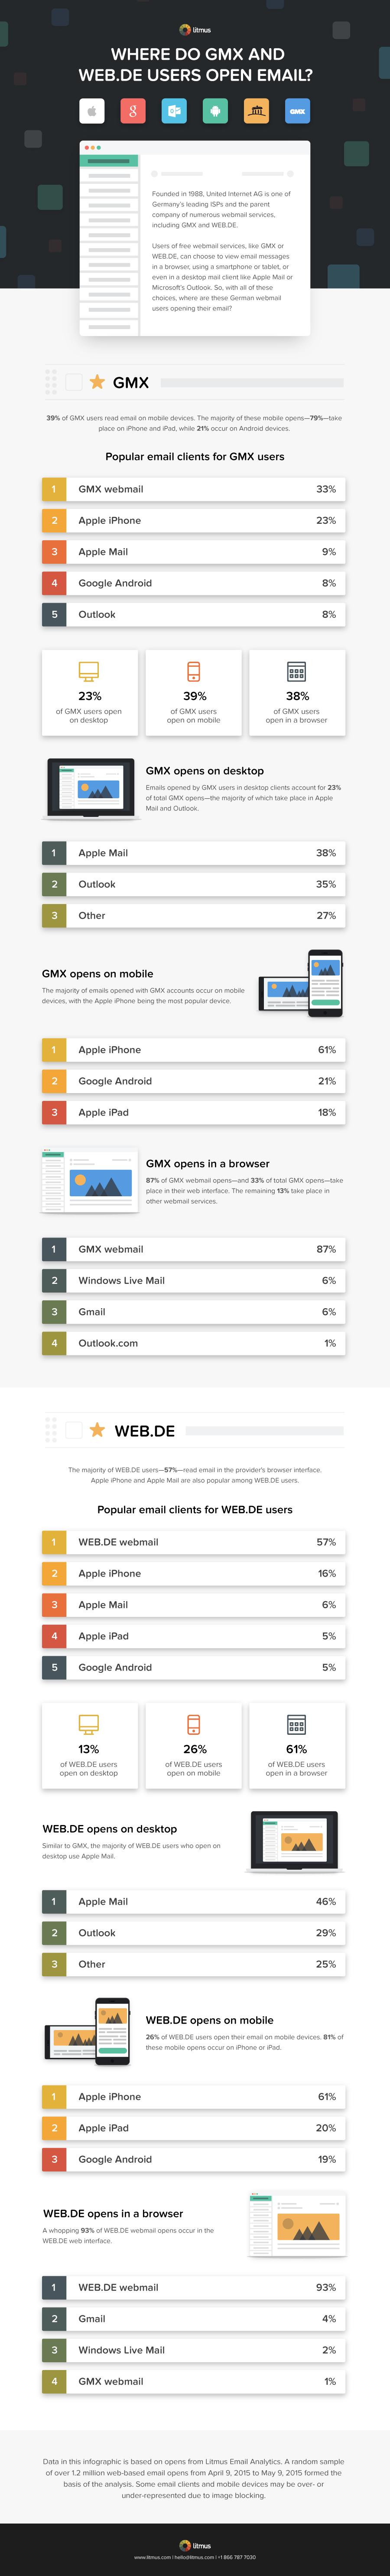 german-webmail-infographic